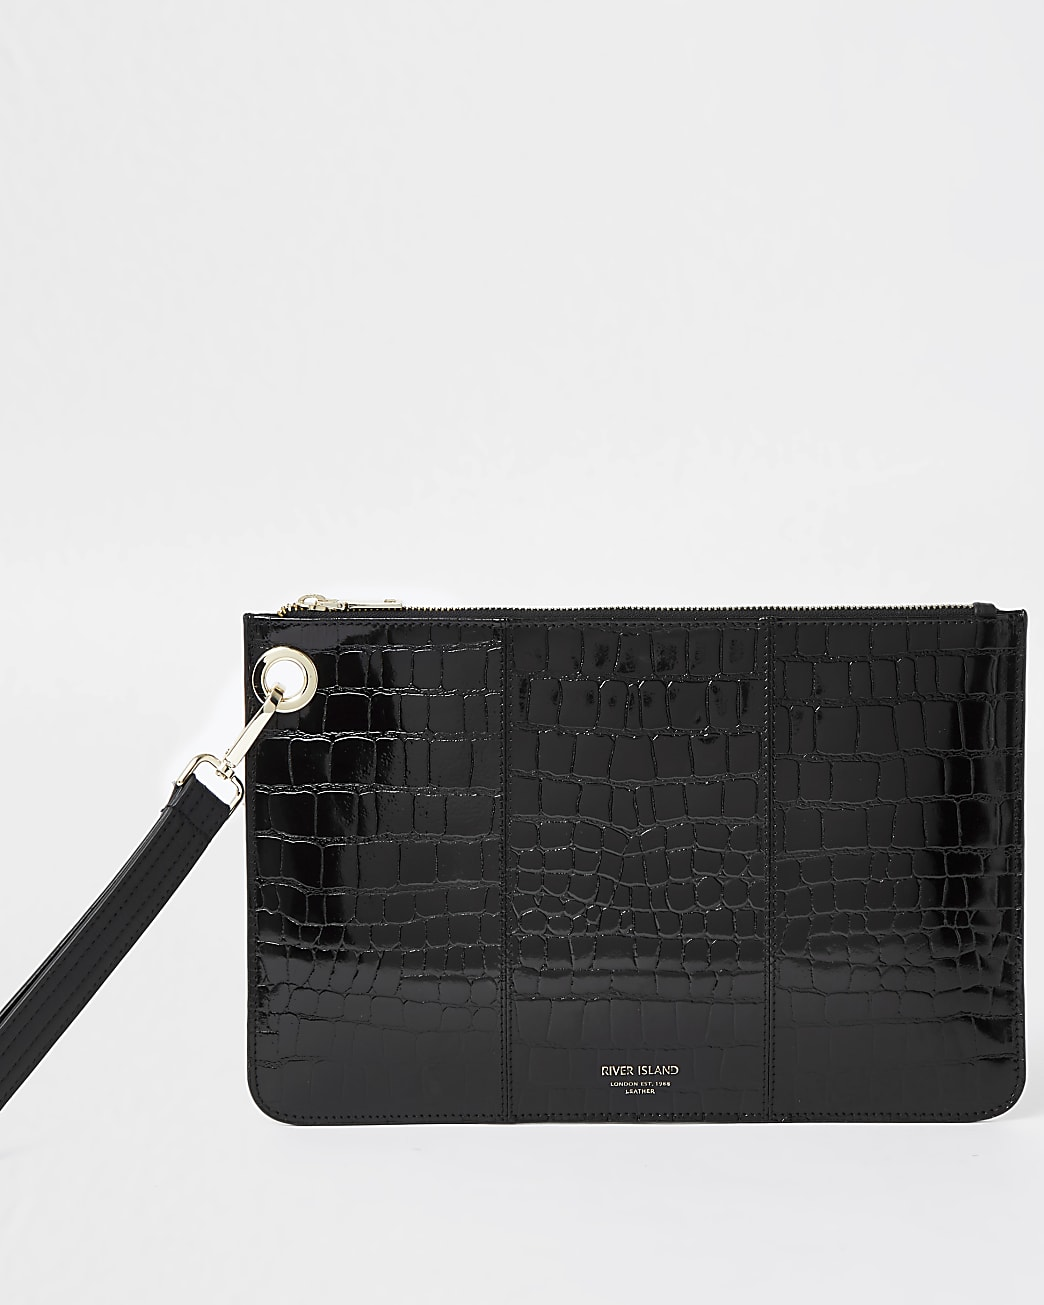 Black leather croc embossed clutch handbag